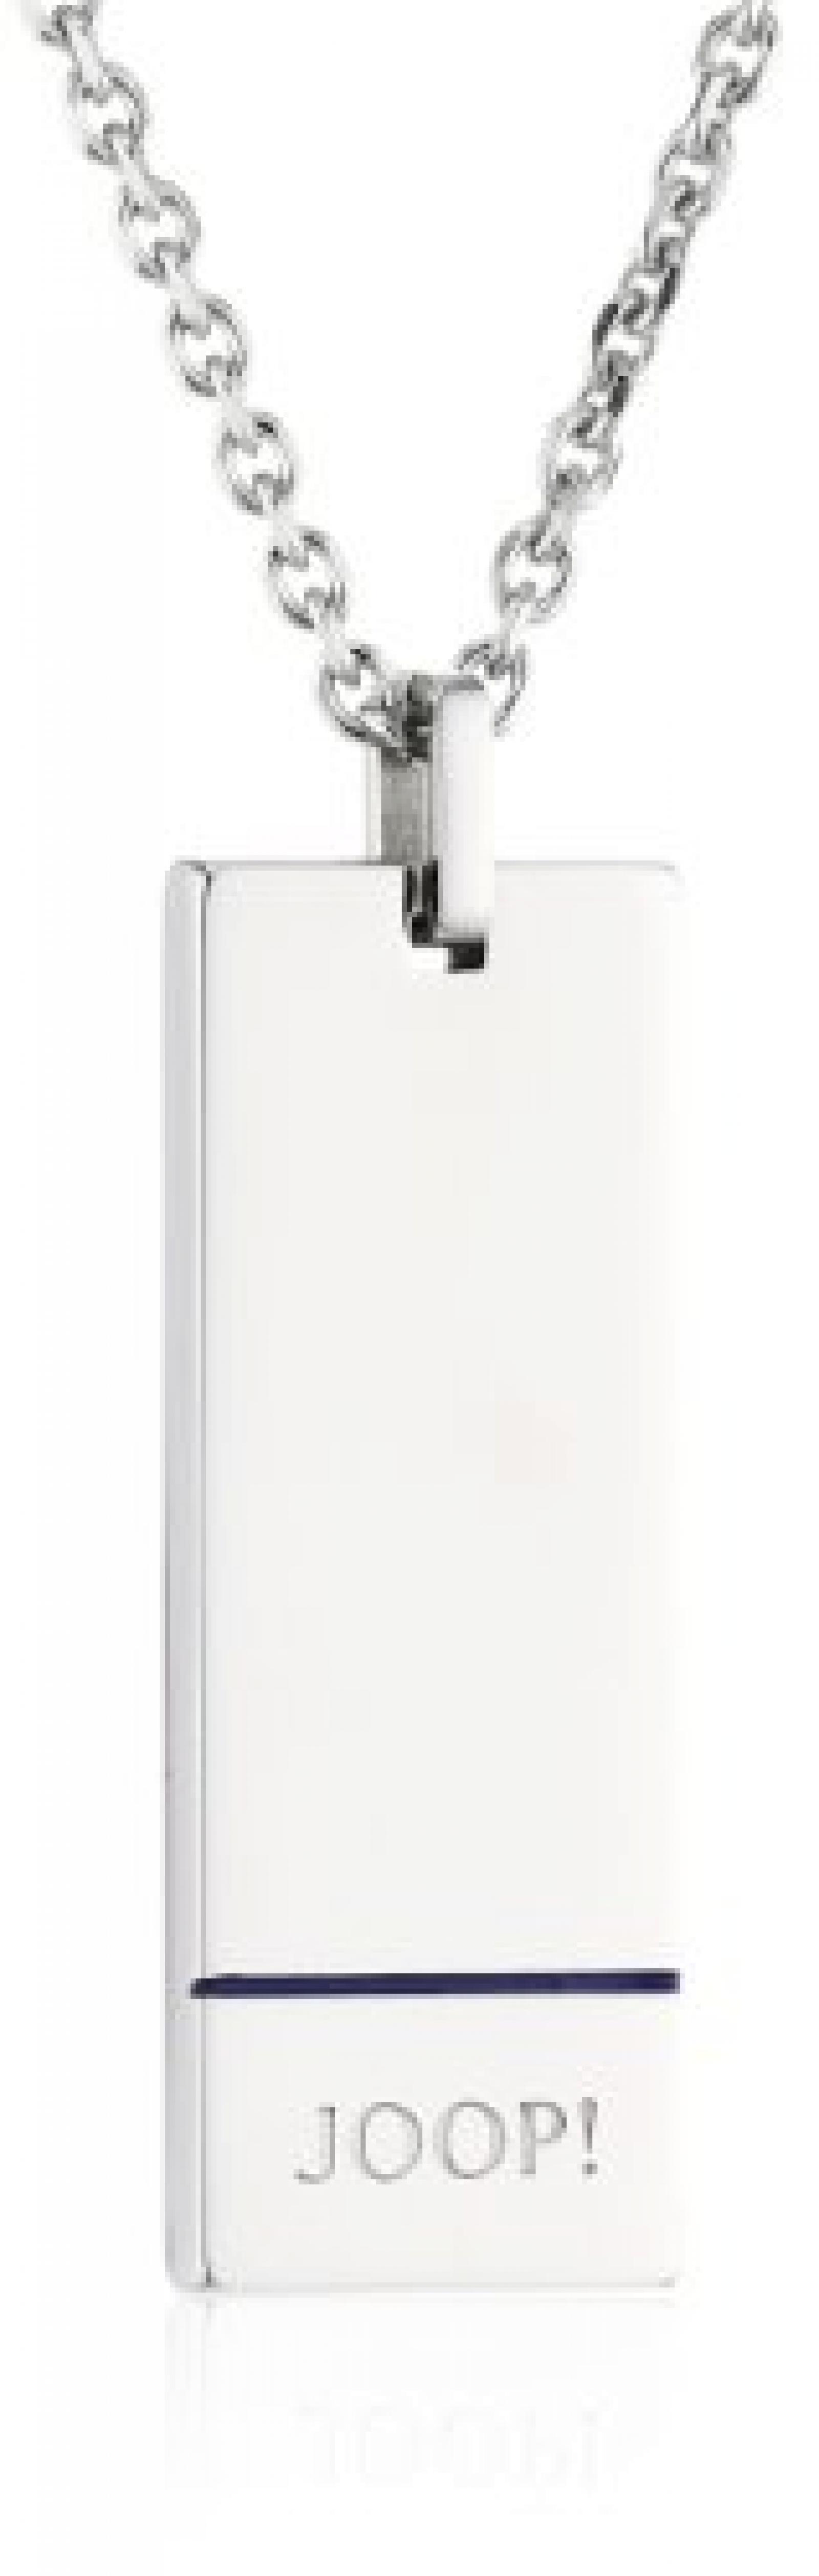 Joop Herren-Halskette George Edelstahl poliert ca. 50 cm (45 + 5 cm) JPNL10525B500